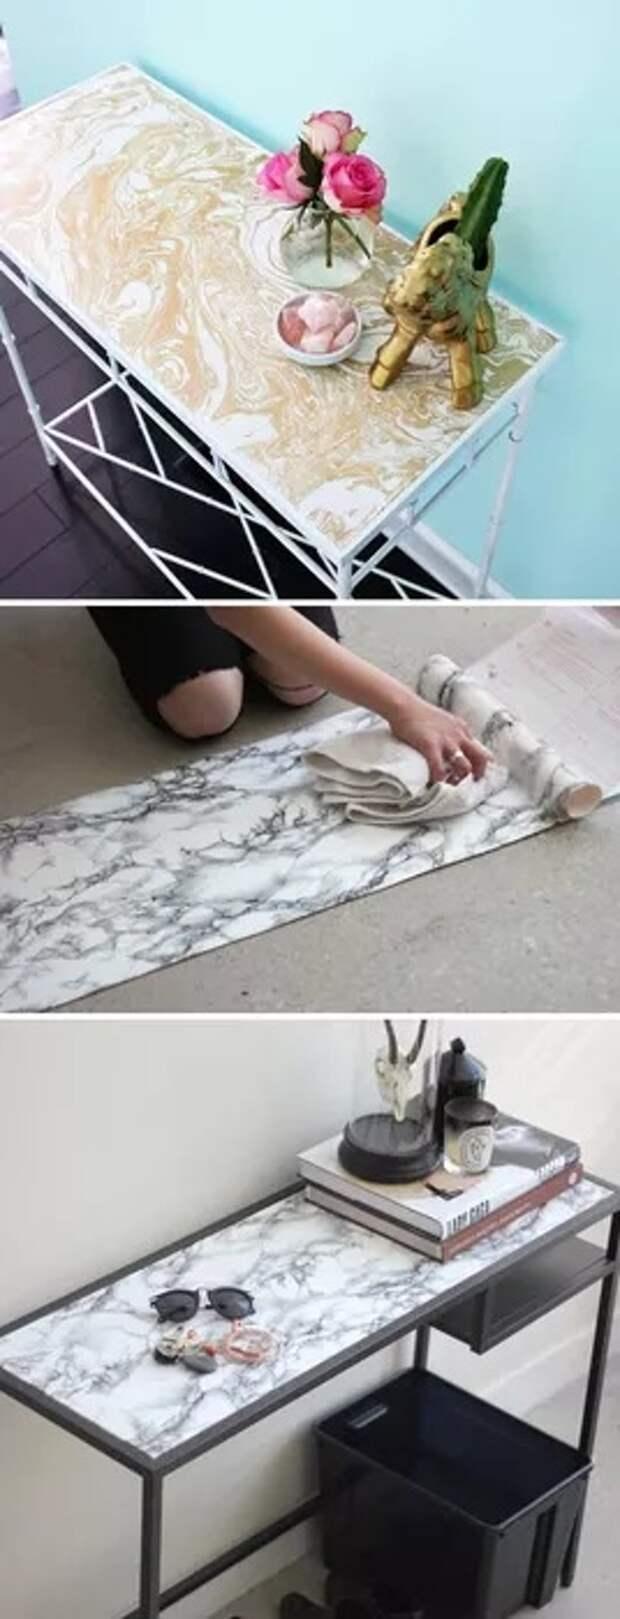 Экспресс-ремонт стен и мебели (подборка)